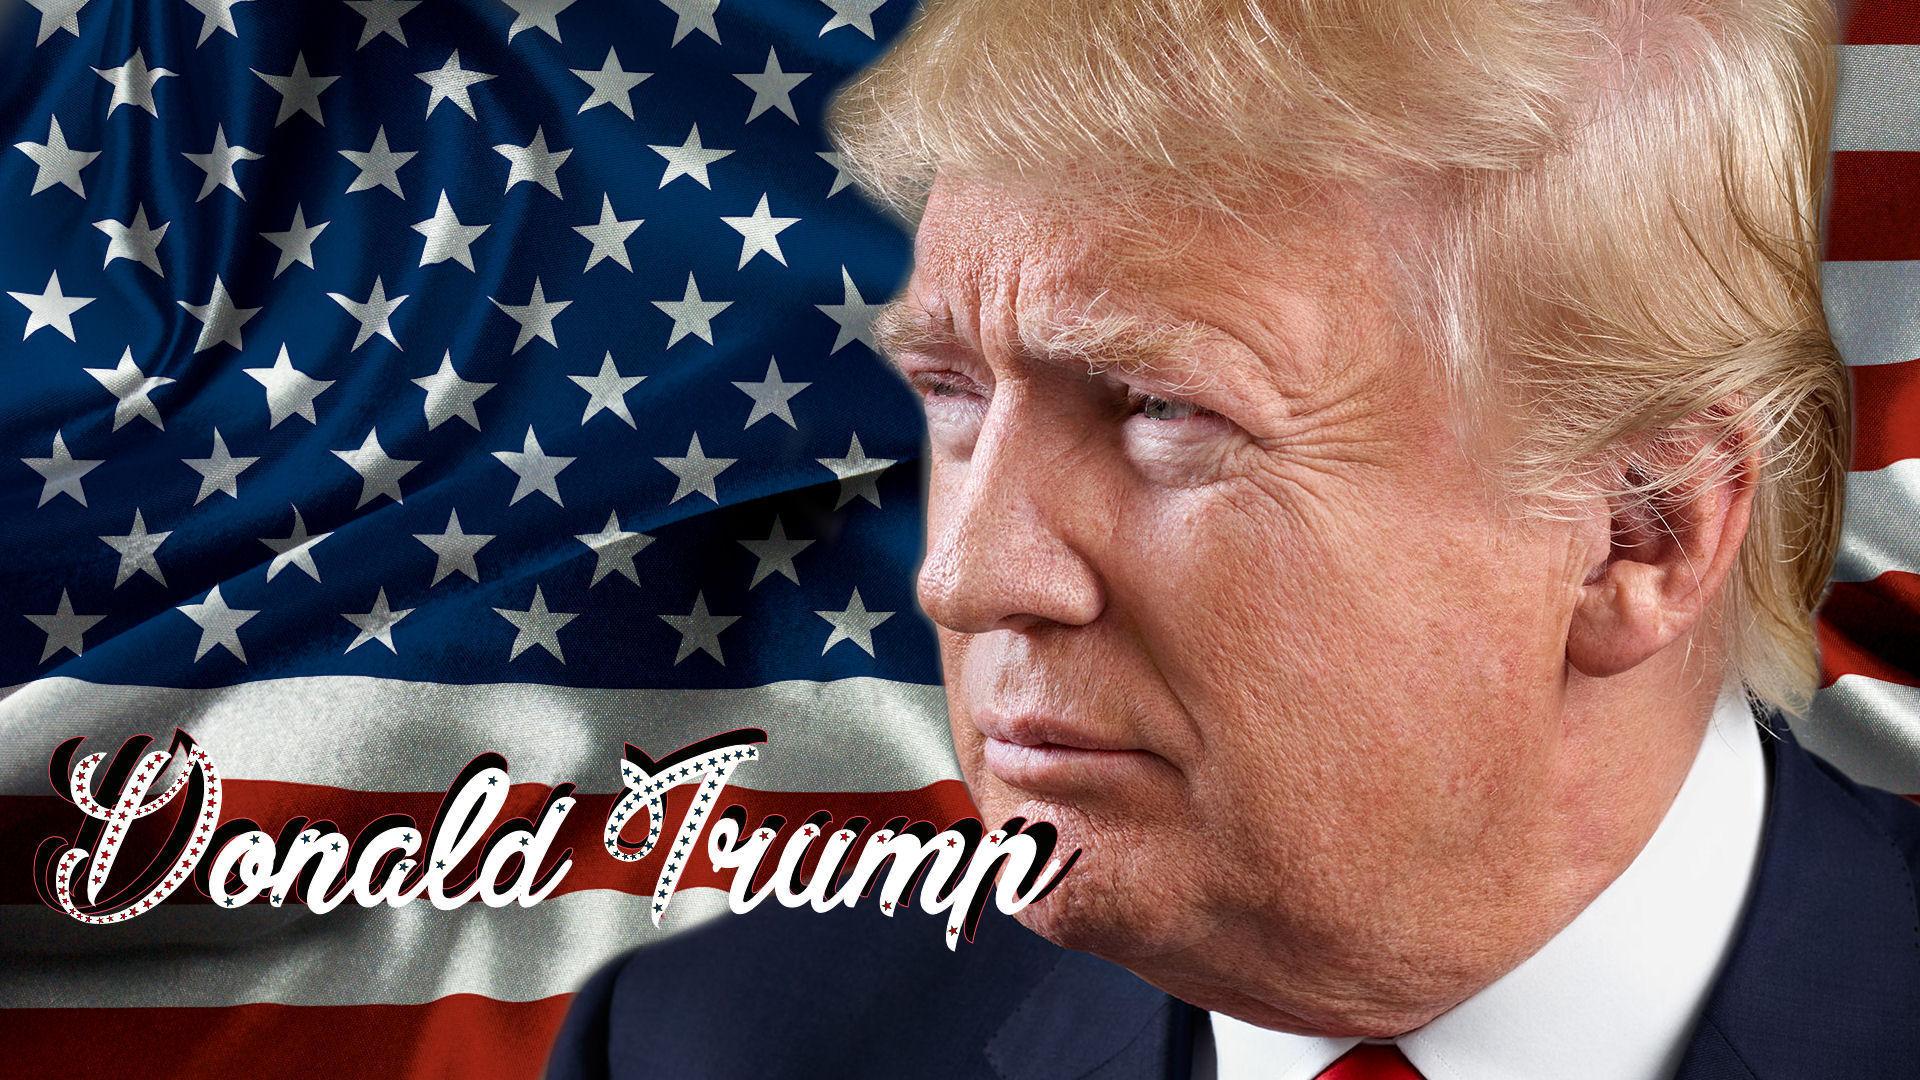 Donald Trump Images Donald Trump Hd Wallpaper And Background Photos